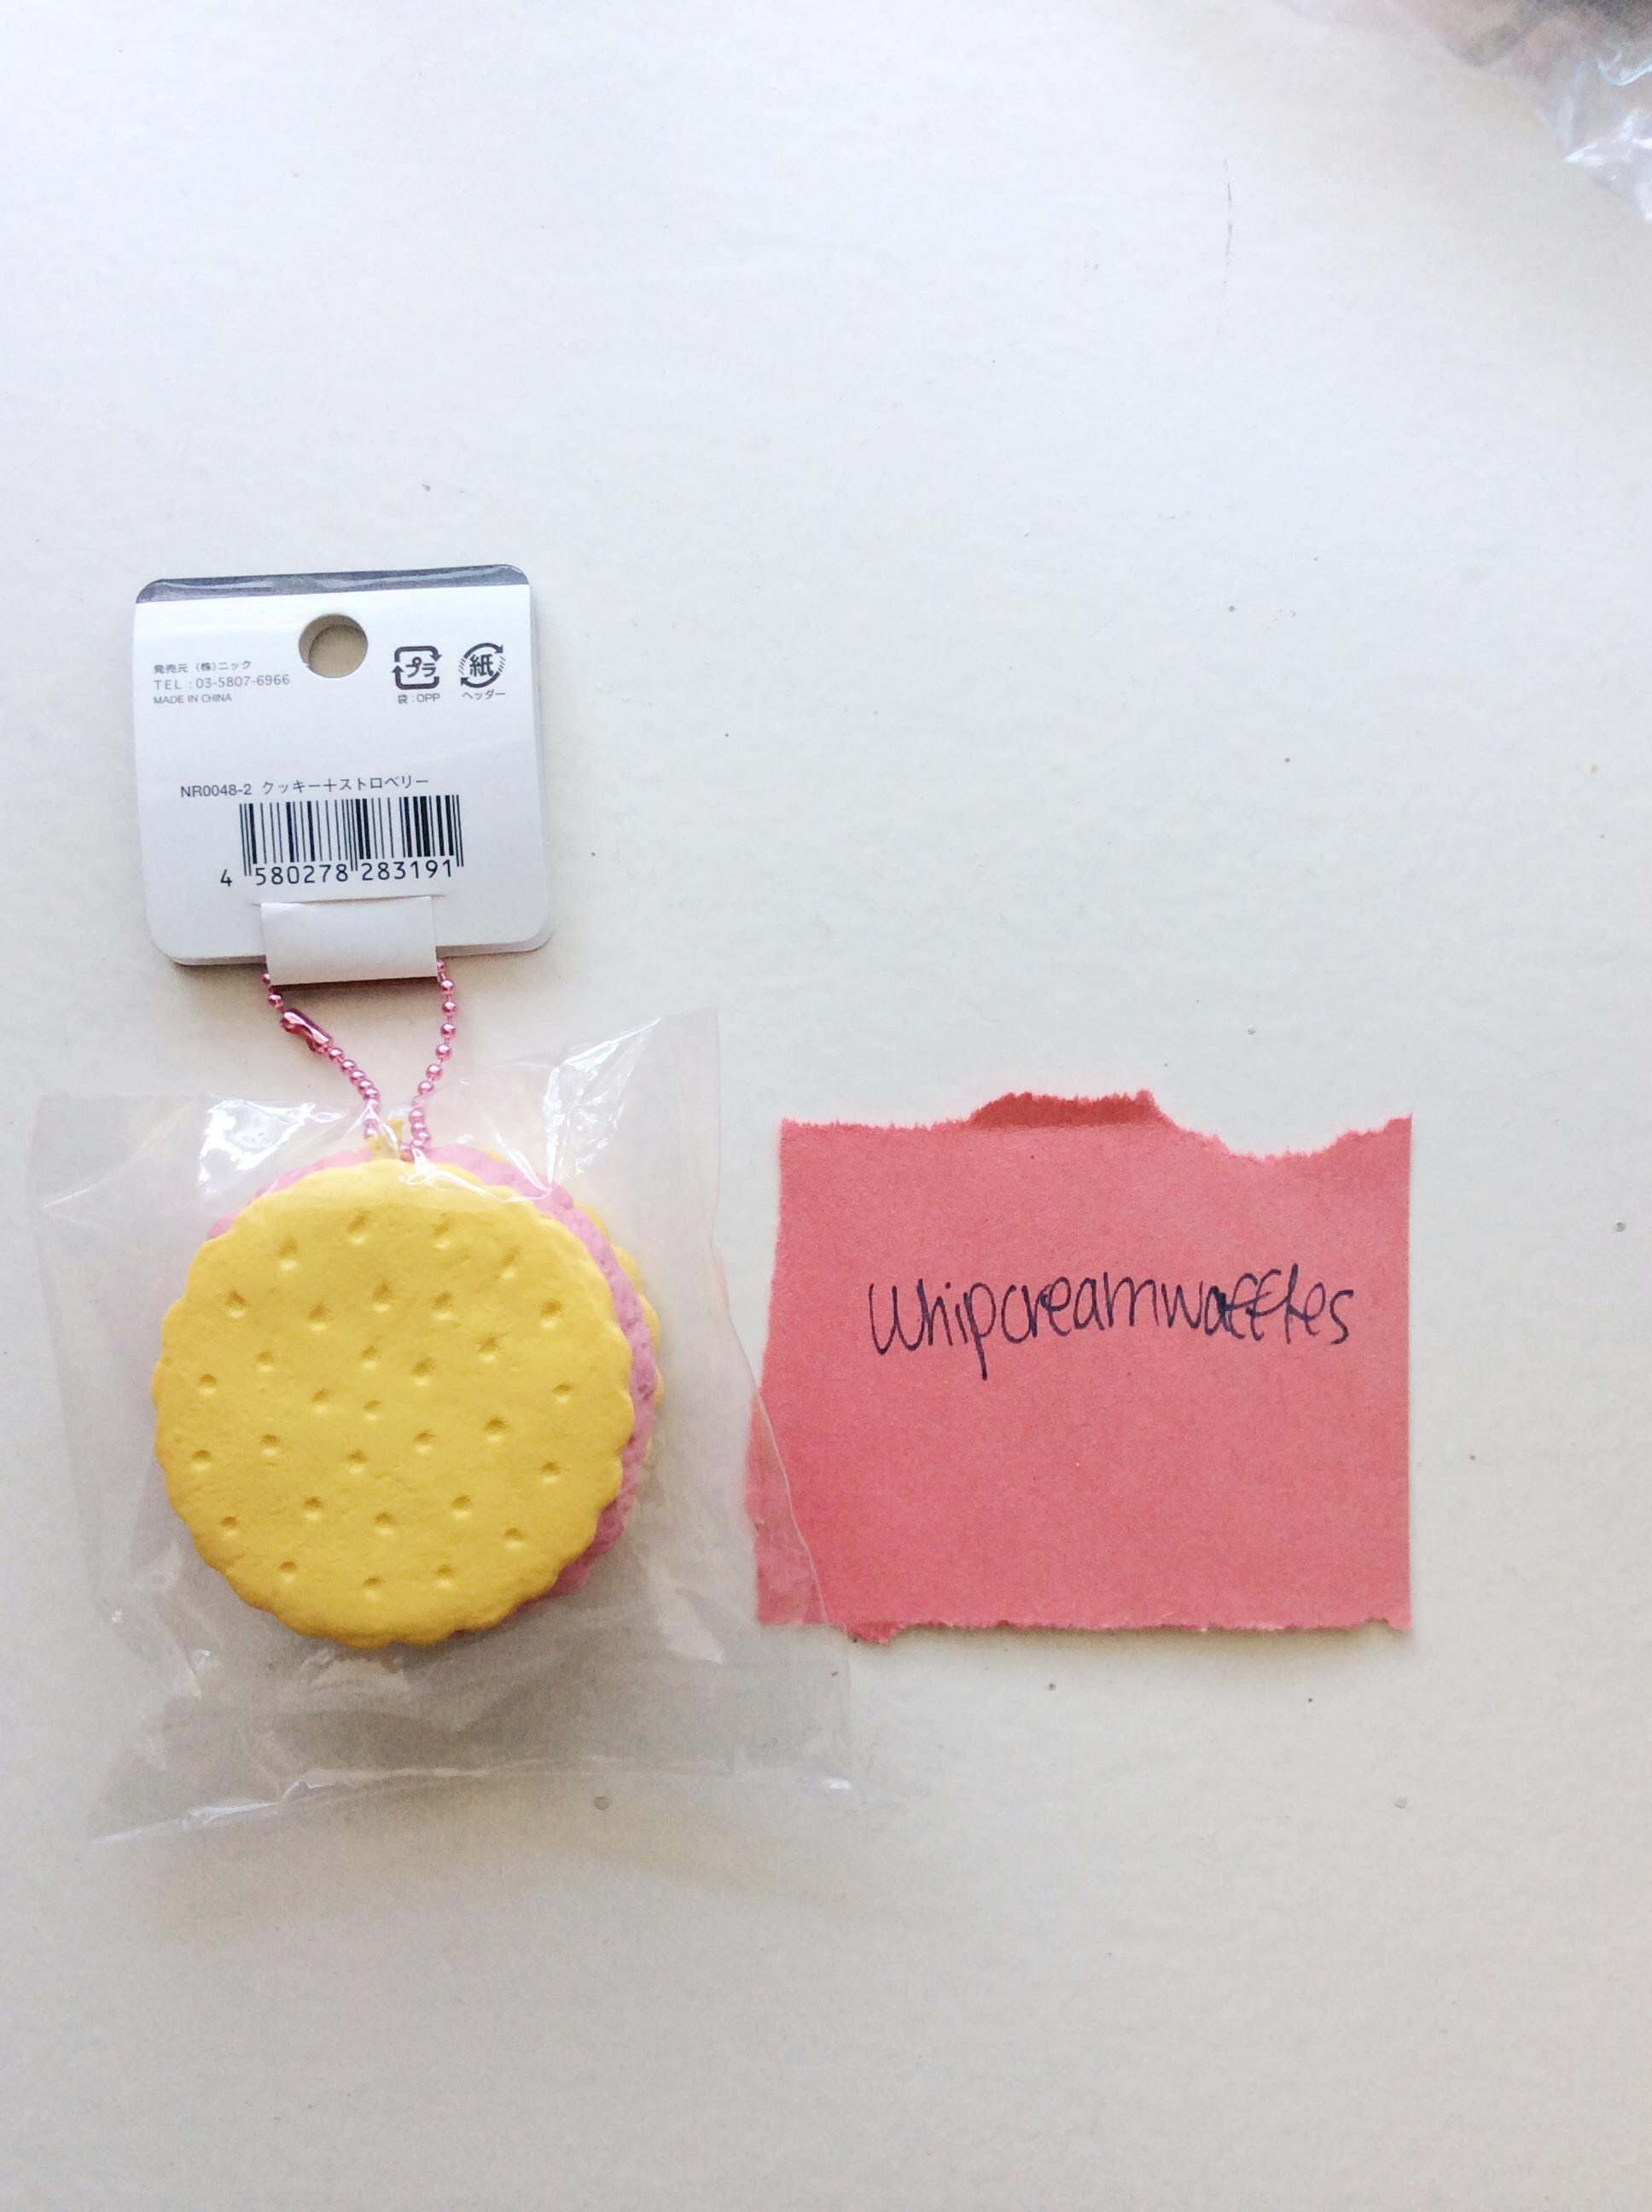 Rare Reproduced Cafe De N Vanilla Strawberry Ice Cream Sandwich Squishy ? Whipcreamwaffles ...